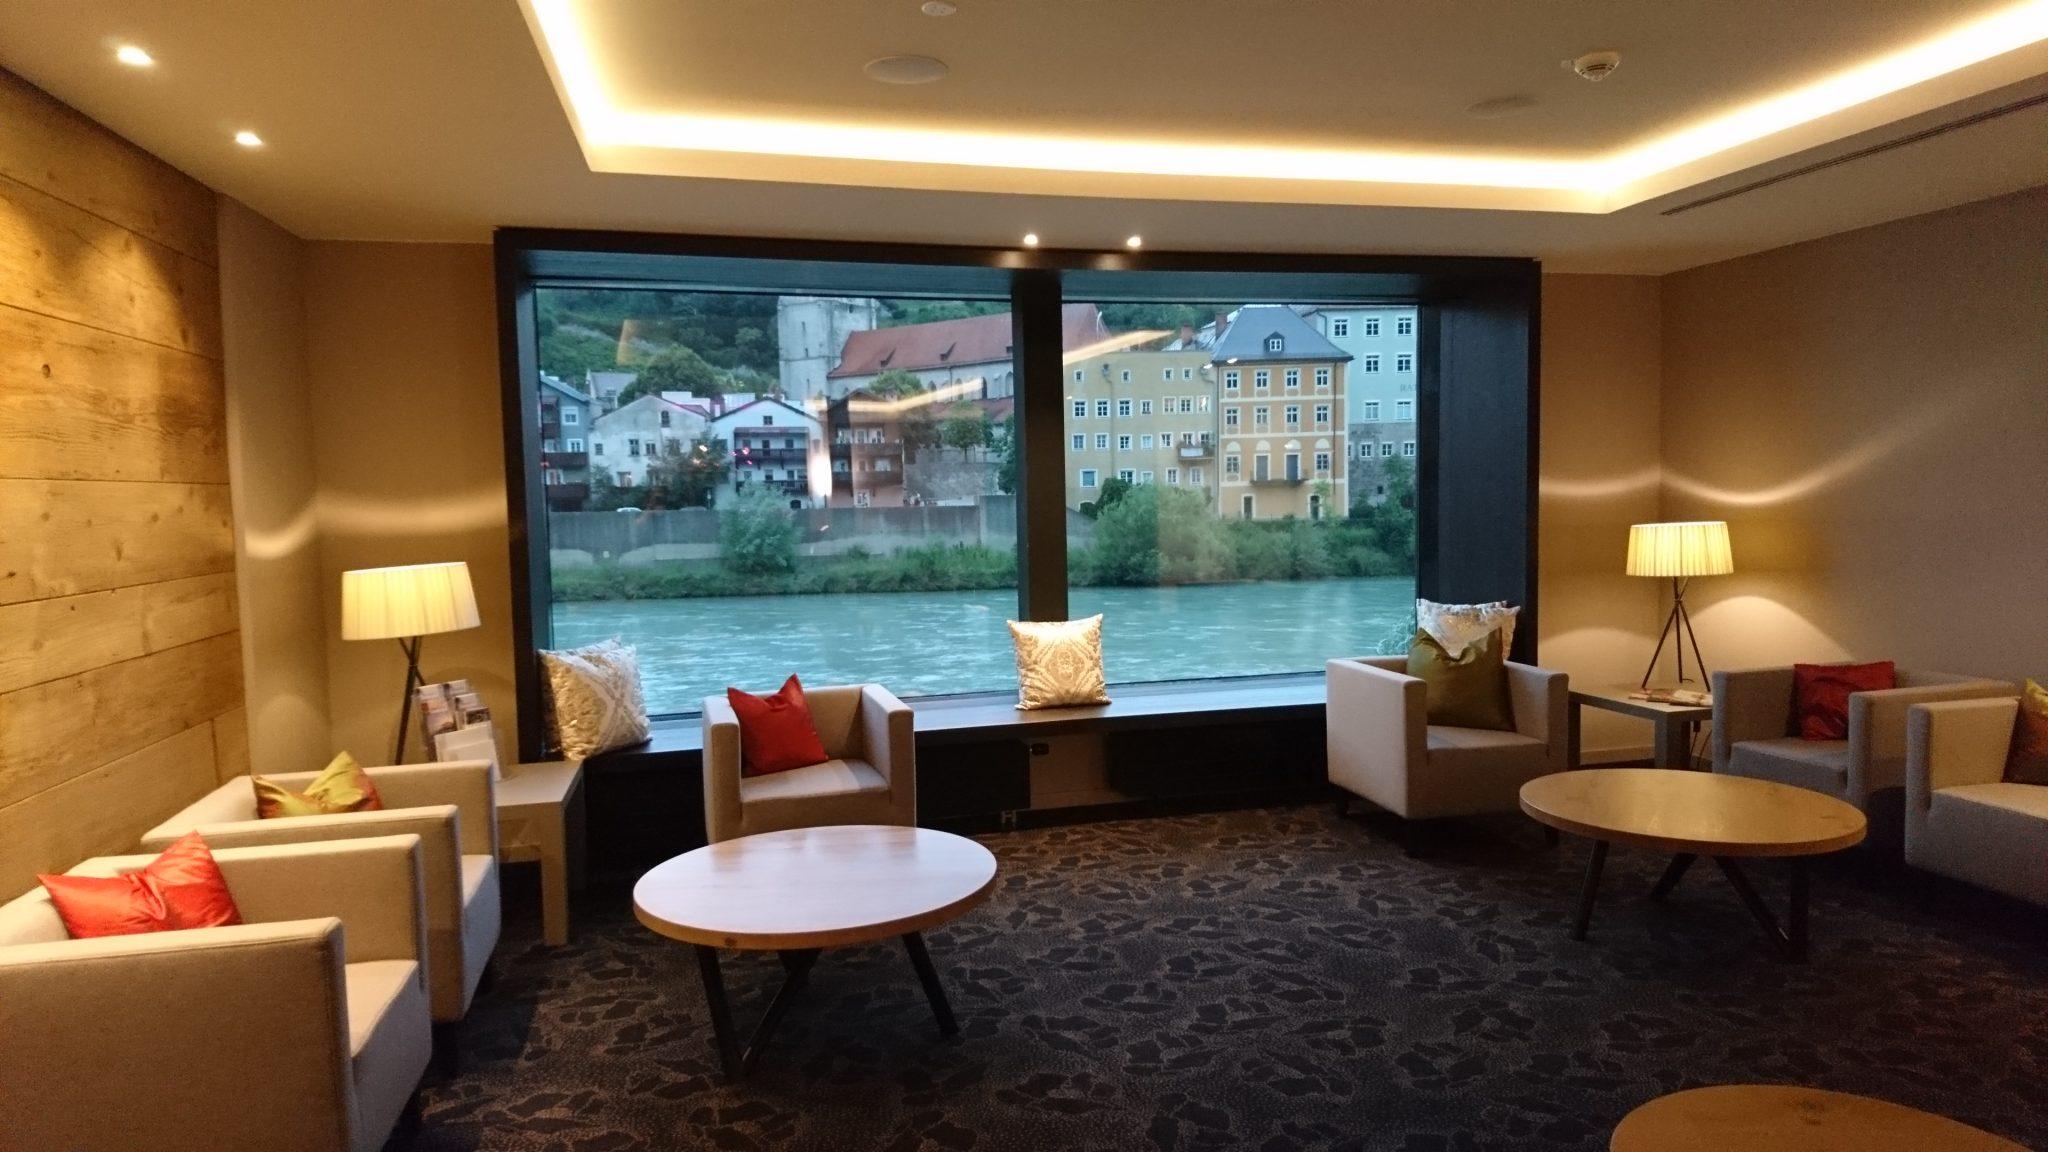 Hotel Burgblick in Ach